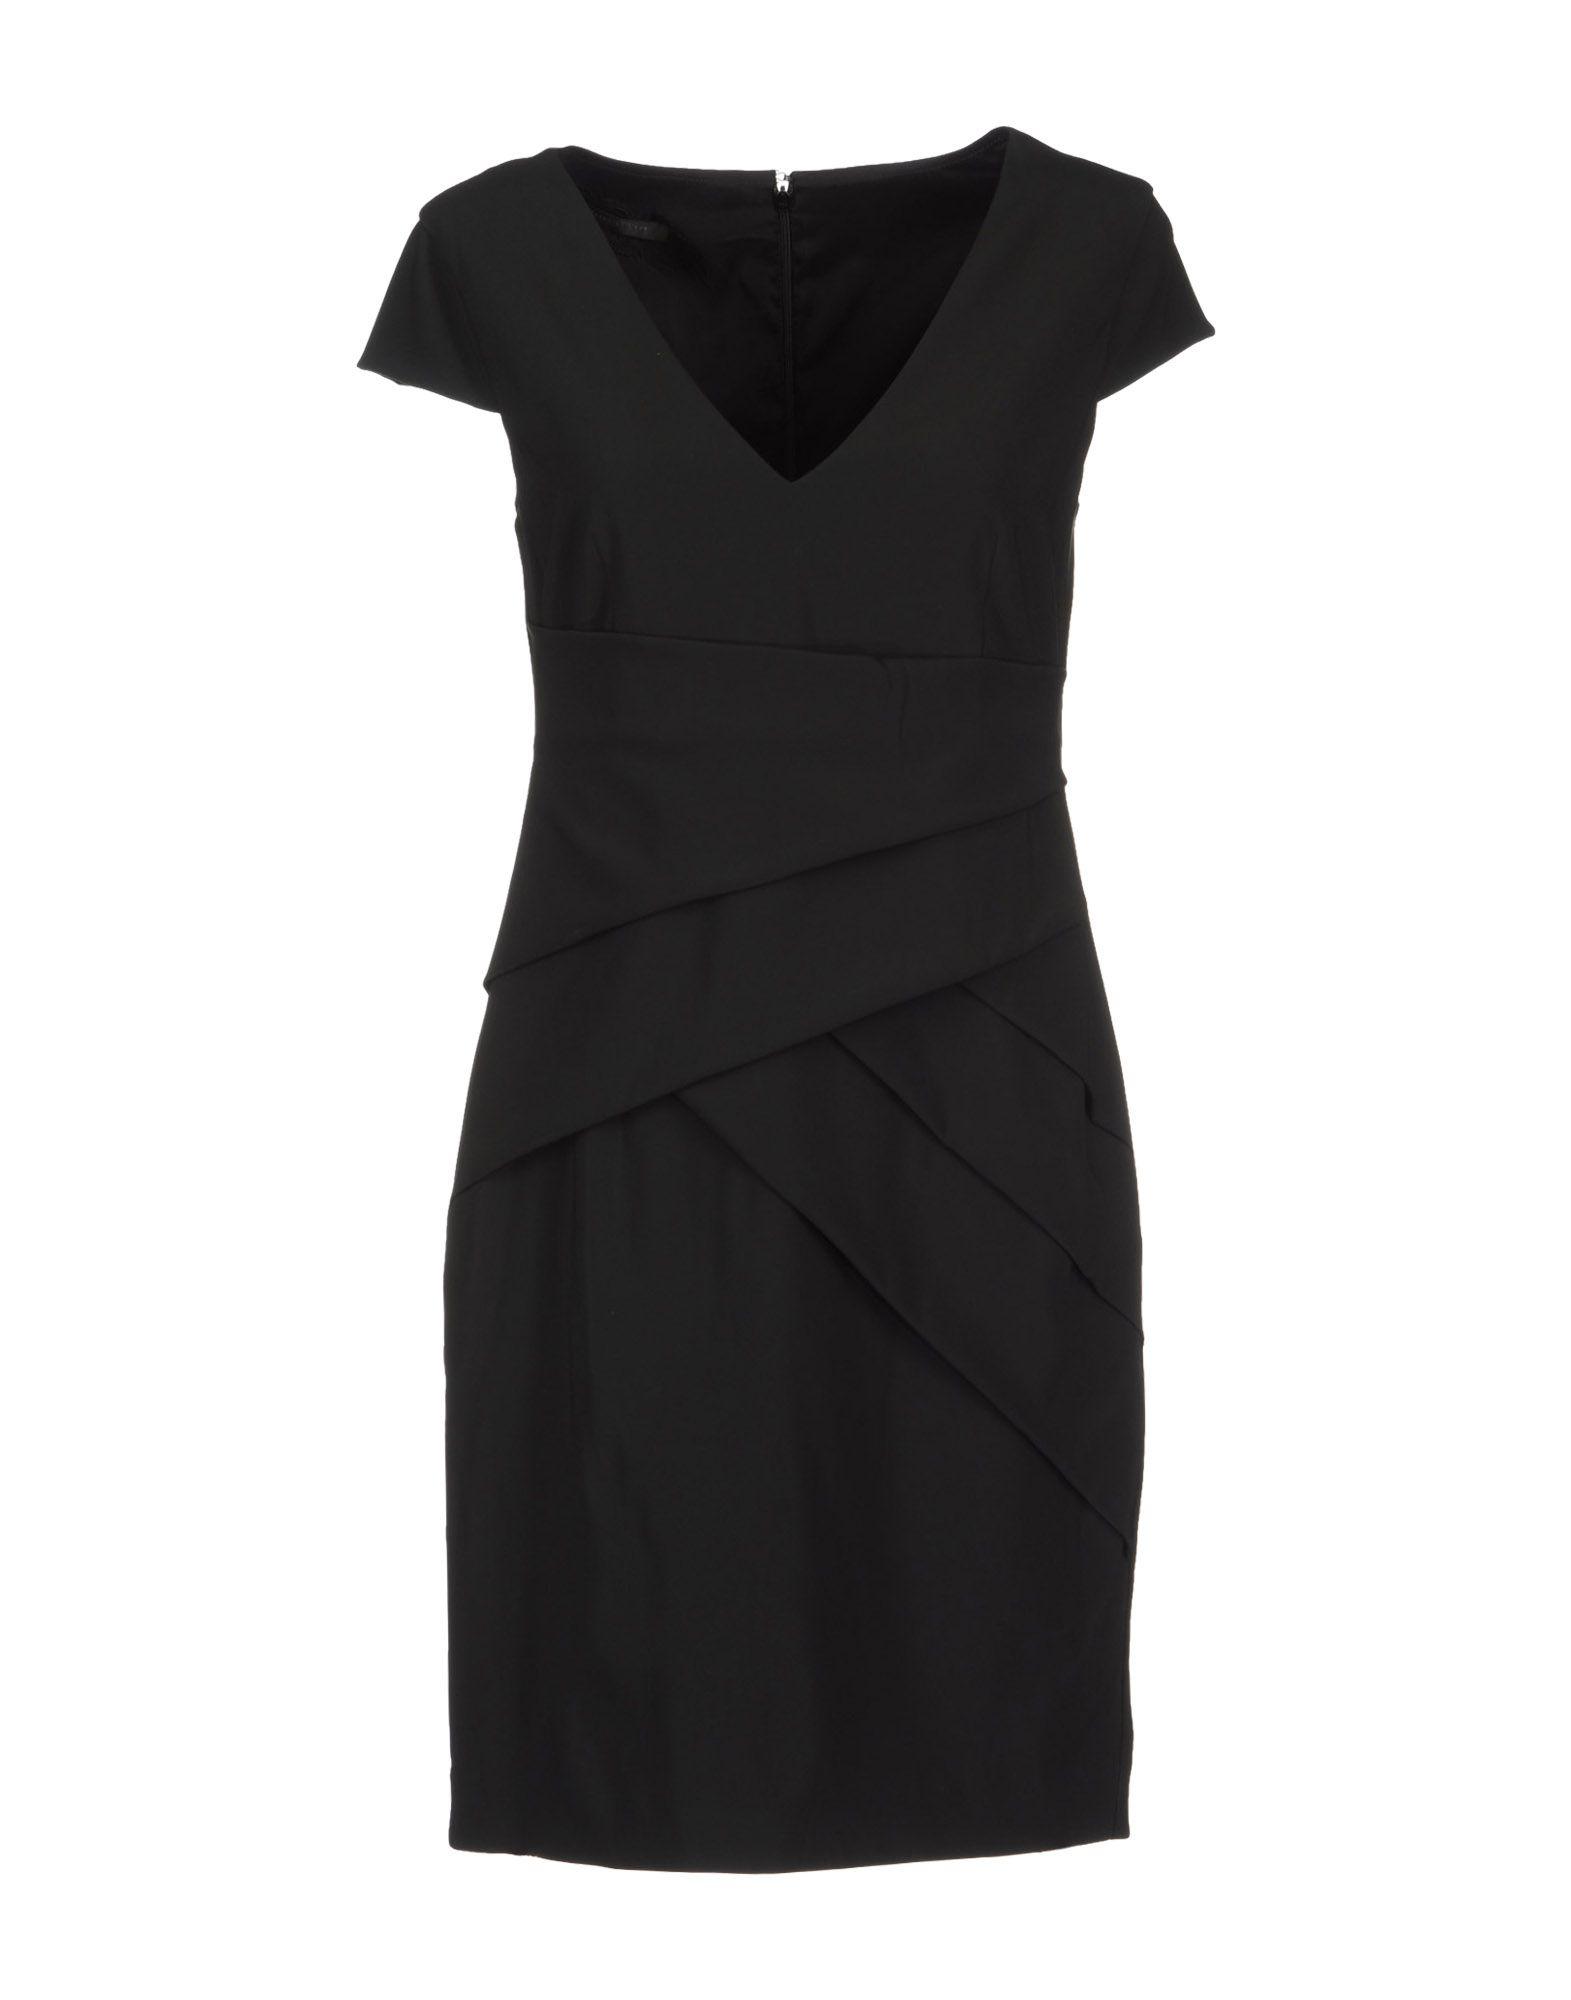 patrizia pepe short dresses in black lyst. Black Bedroom Furniture Sets. Home Design Ideas